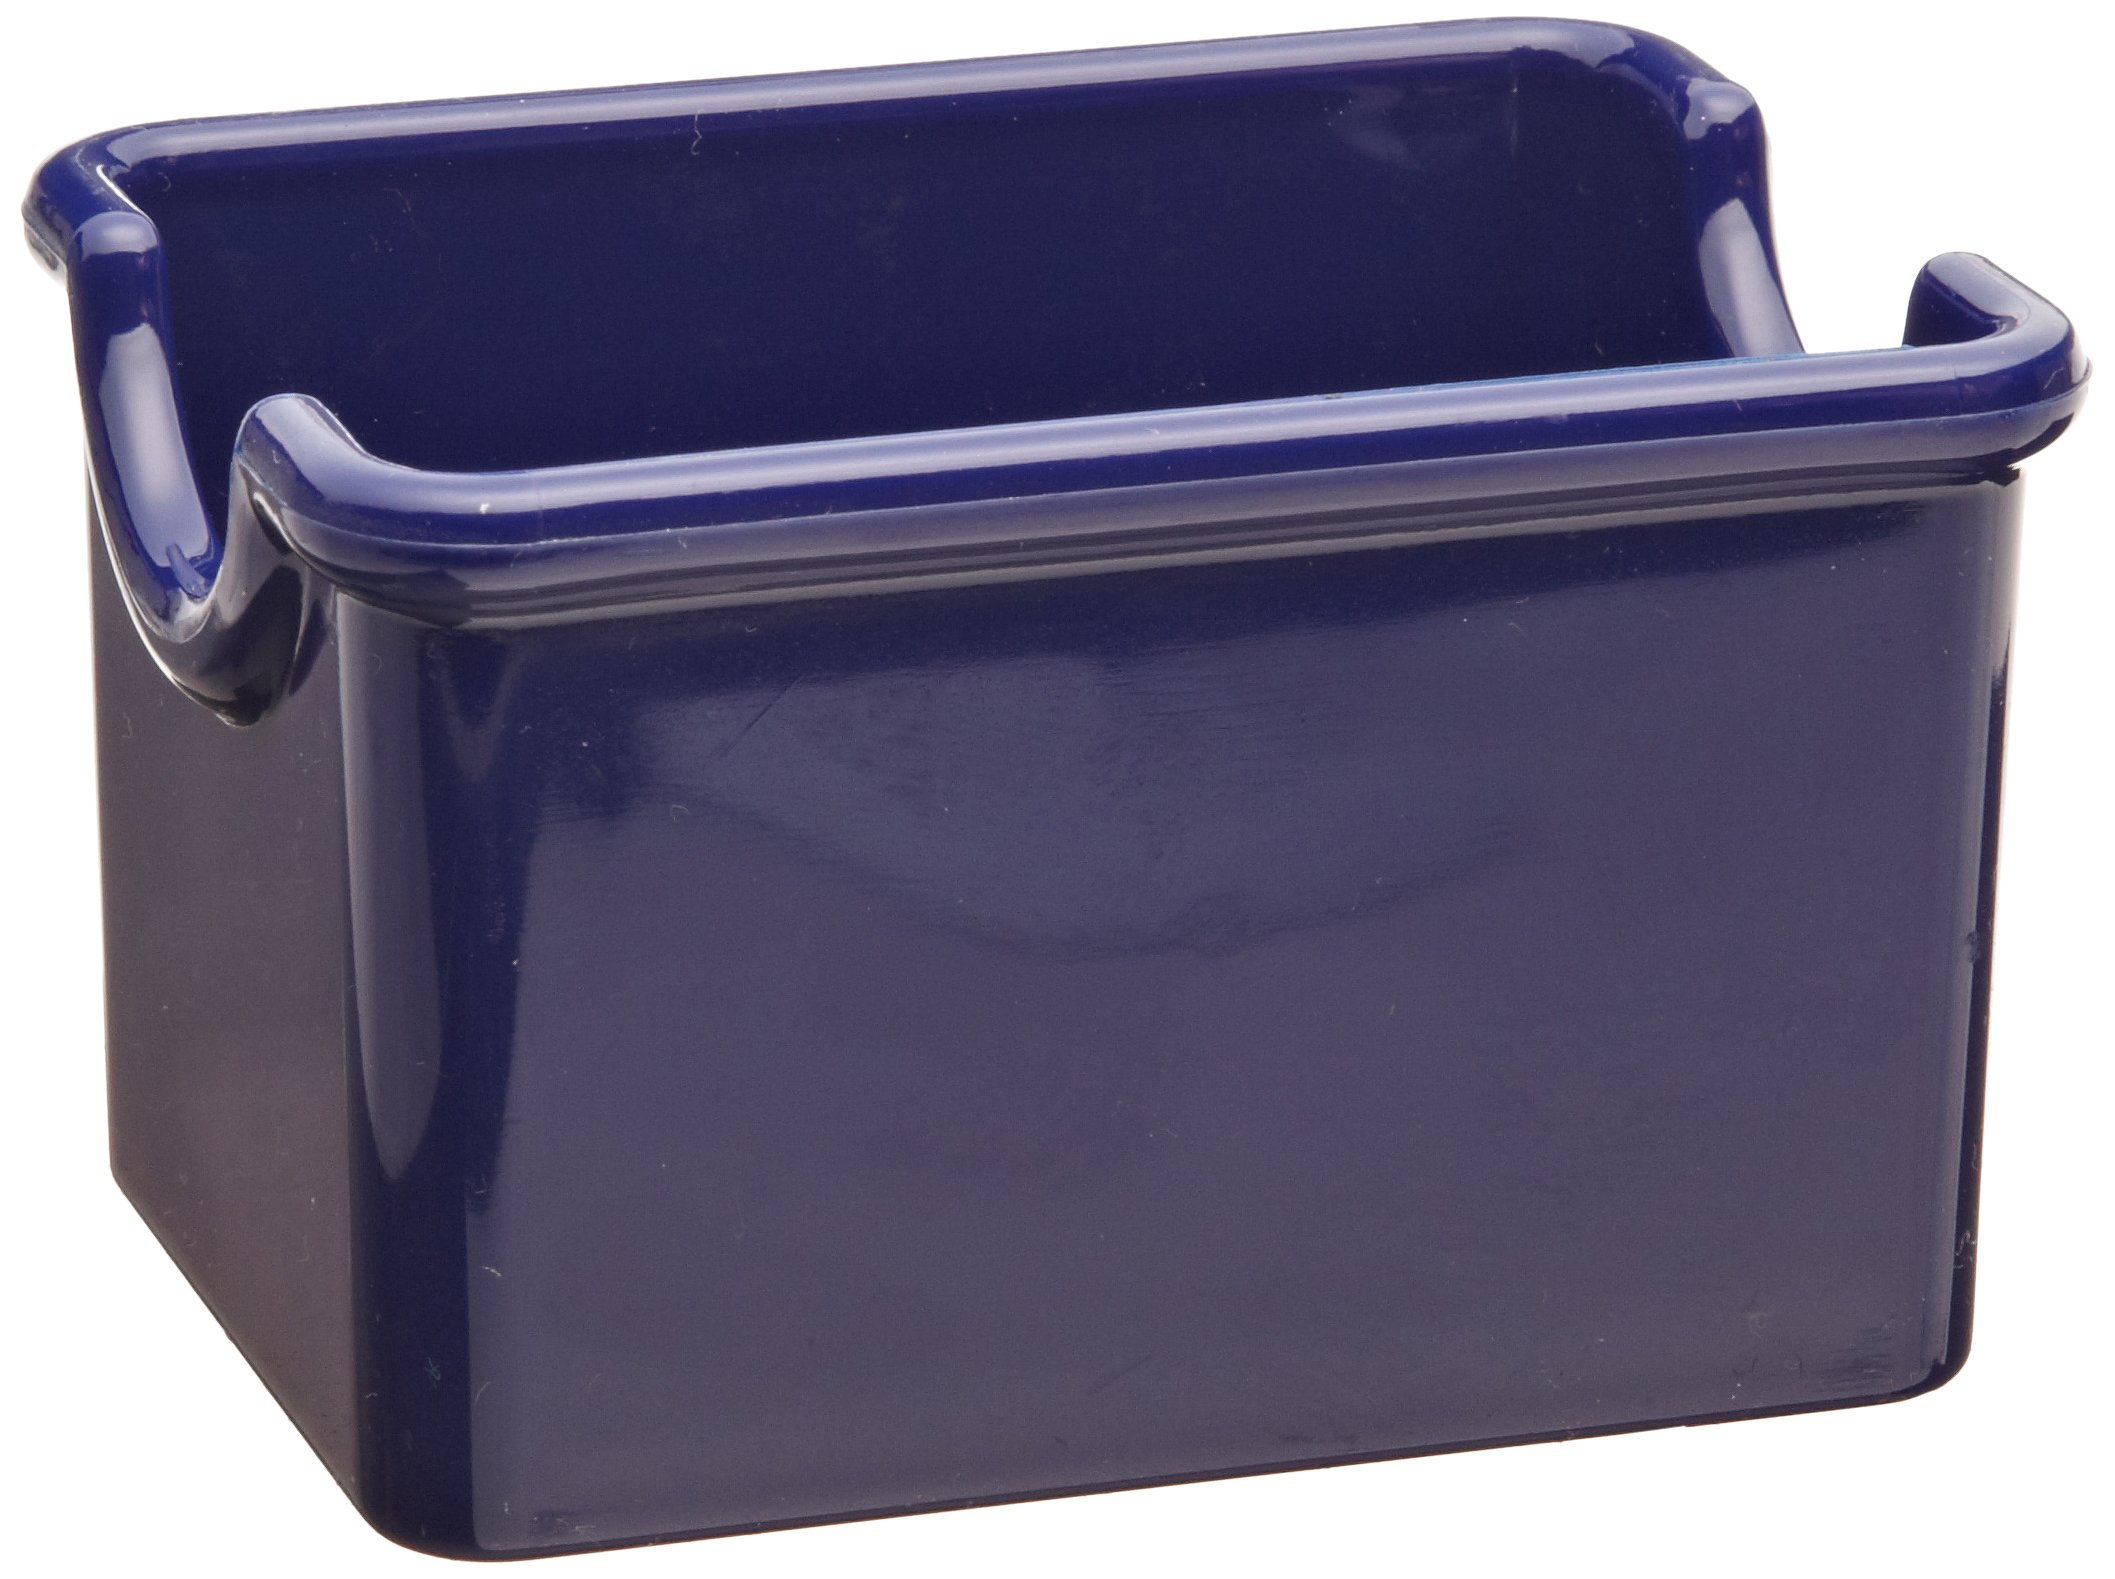 Carlisle 455060 Styrene Sugar Caddy, Cobalt Blue